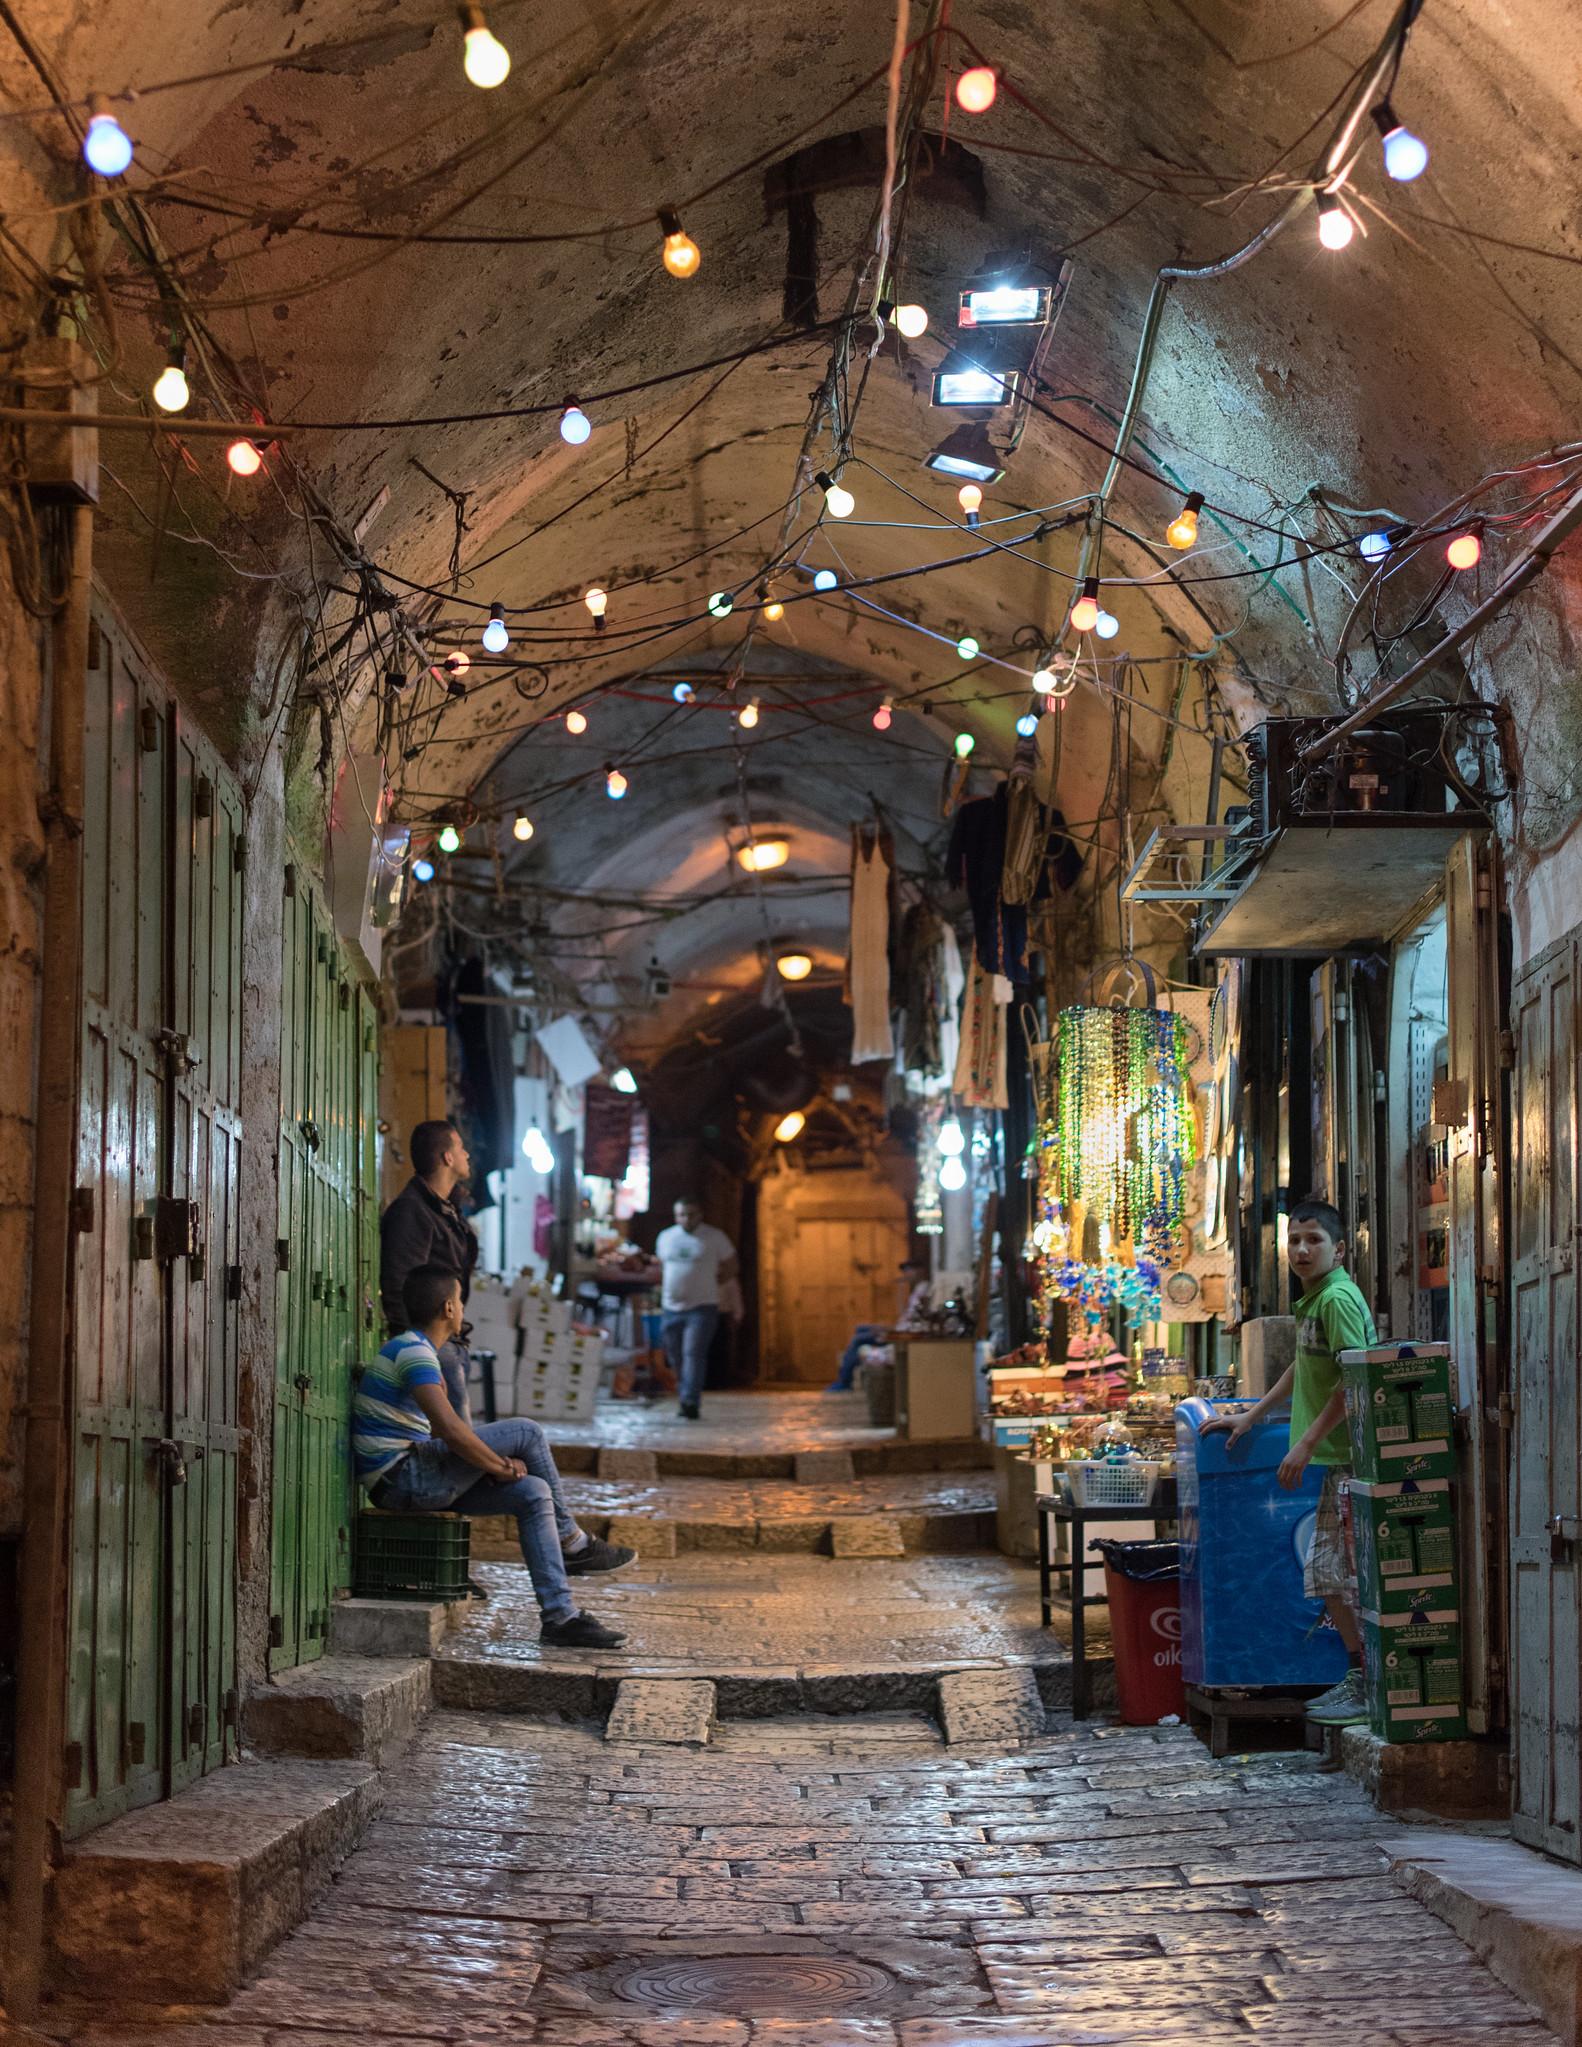 Old City Alley Lights